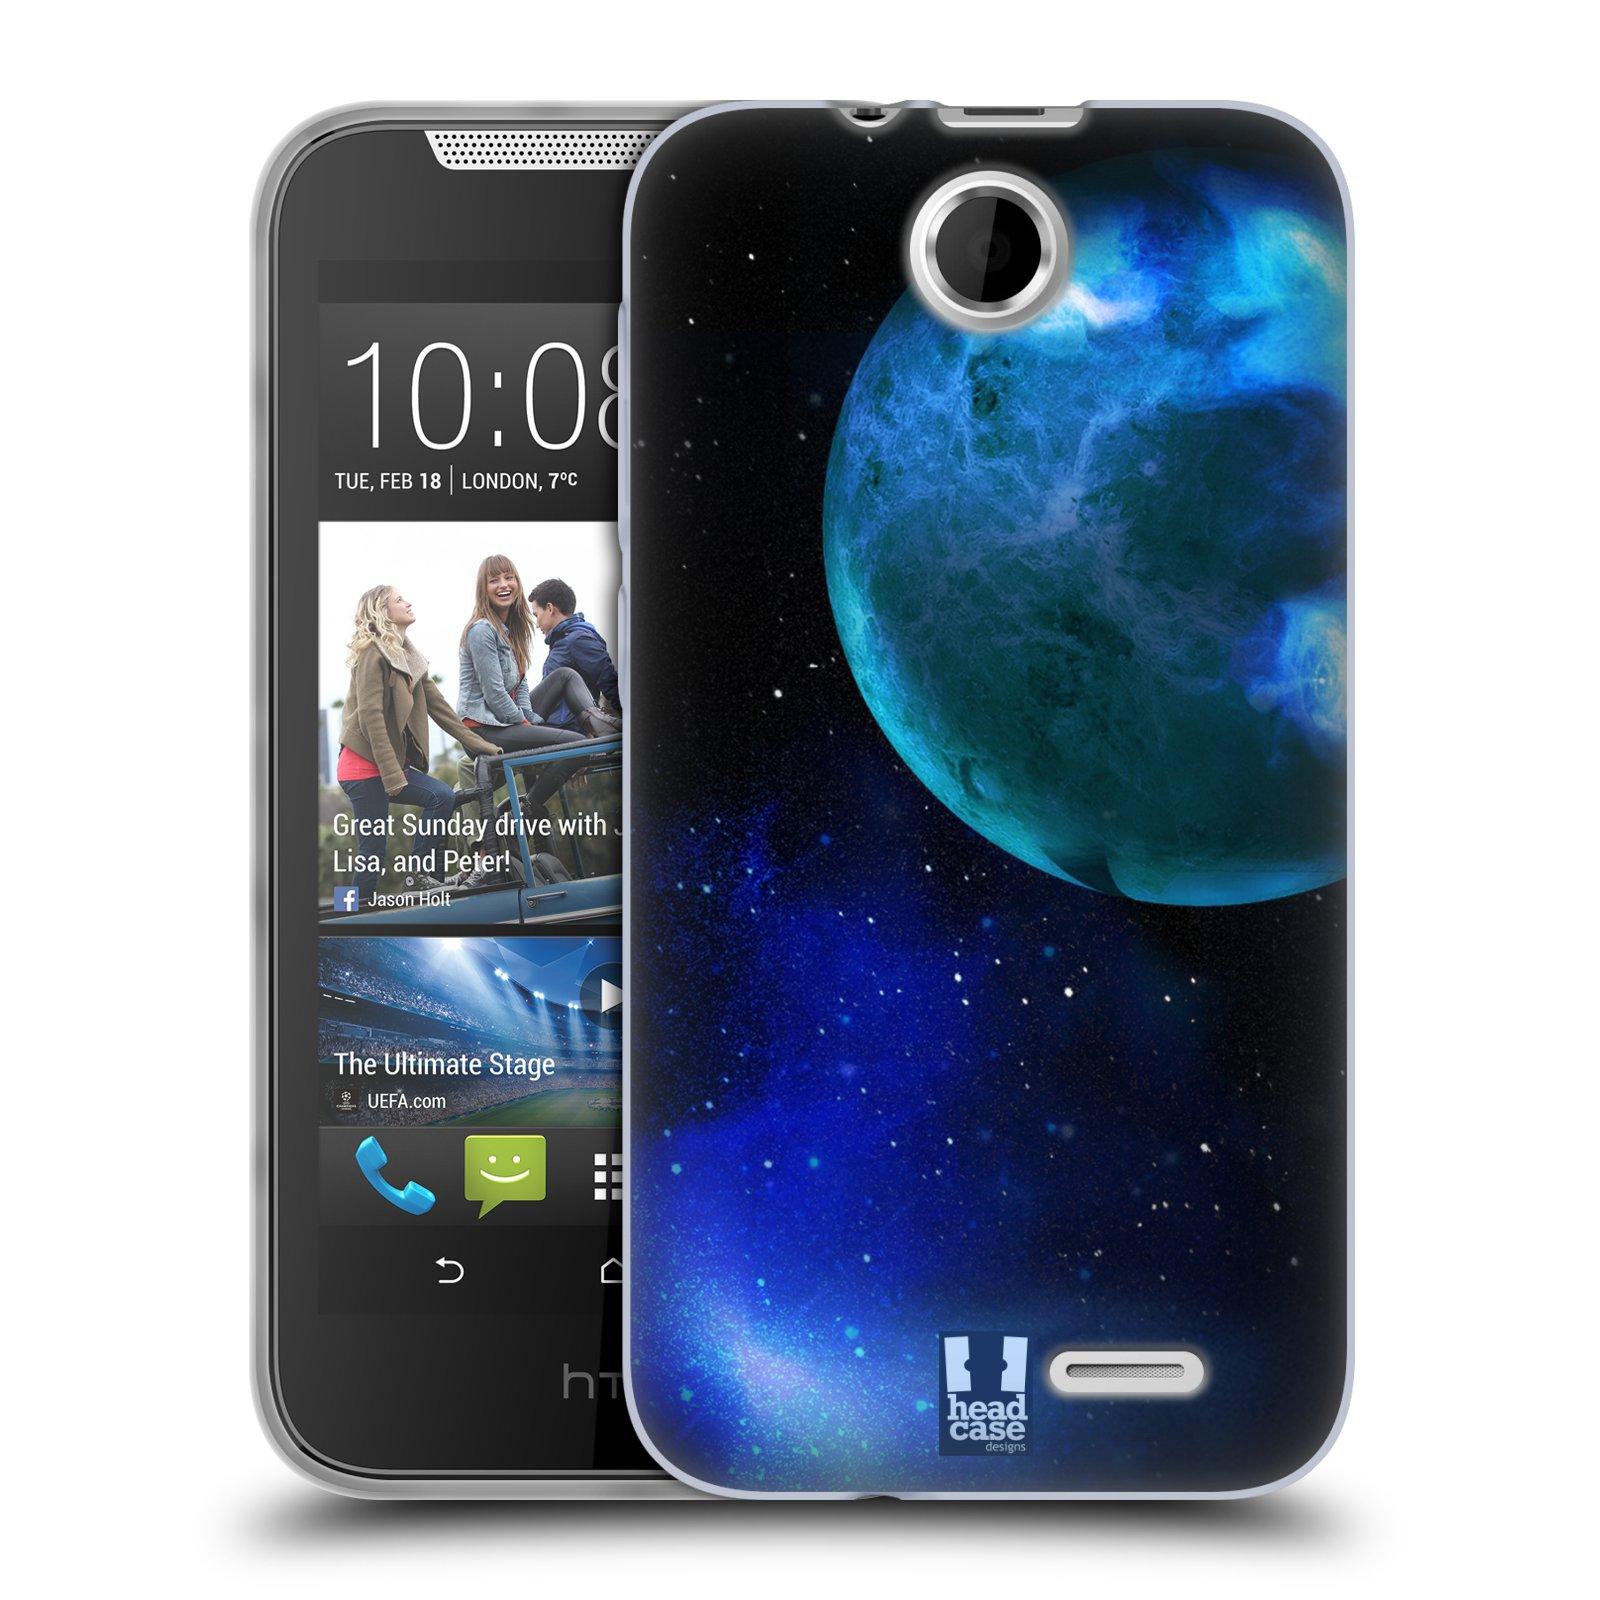 Silikonové pouzdro na mobil HTC Desire 310 HEAD CASE VENUŠE (Silikonový kryt či obal na mobilní telefon HTC Desire 310)